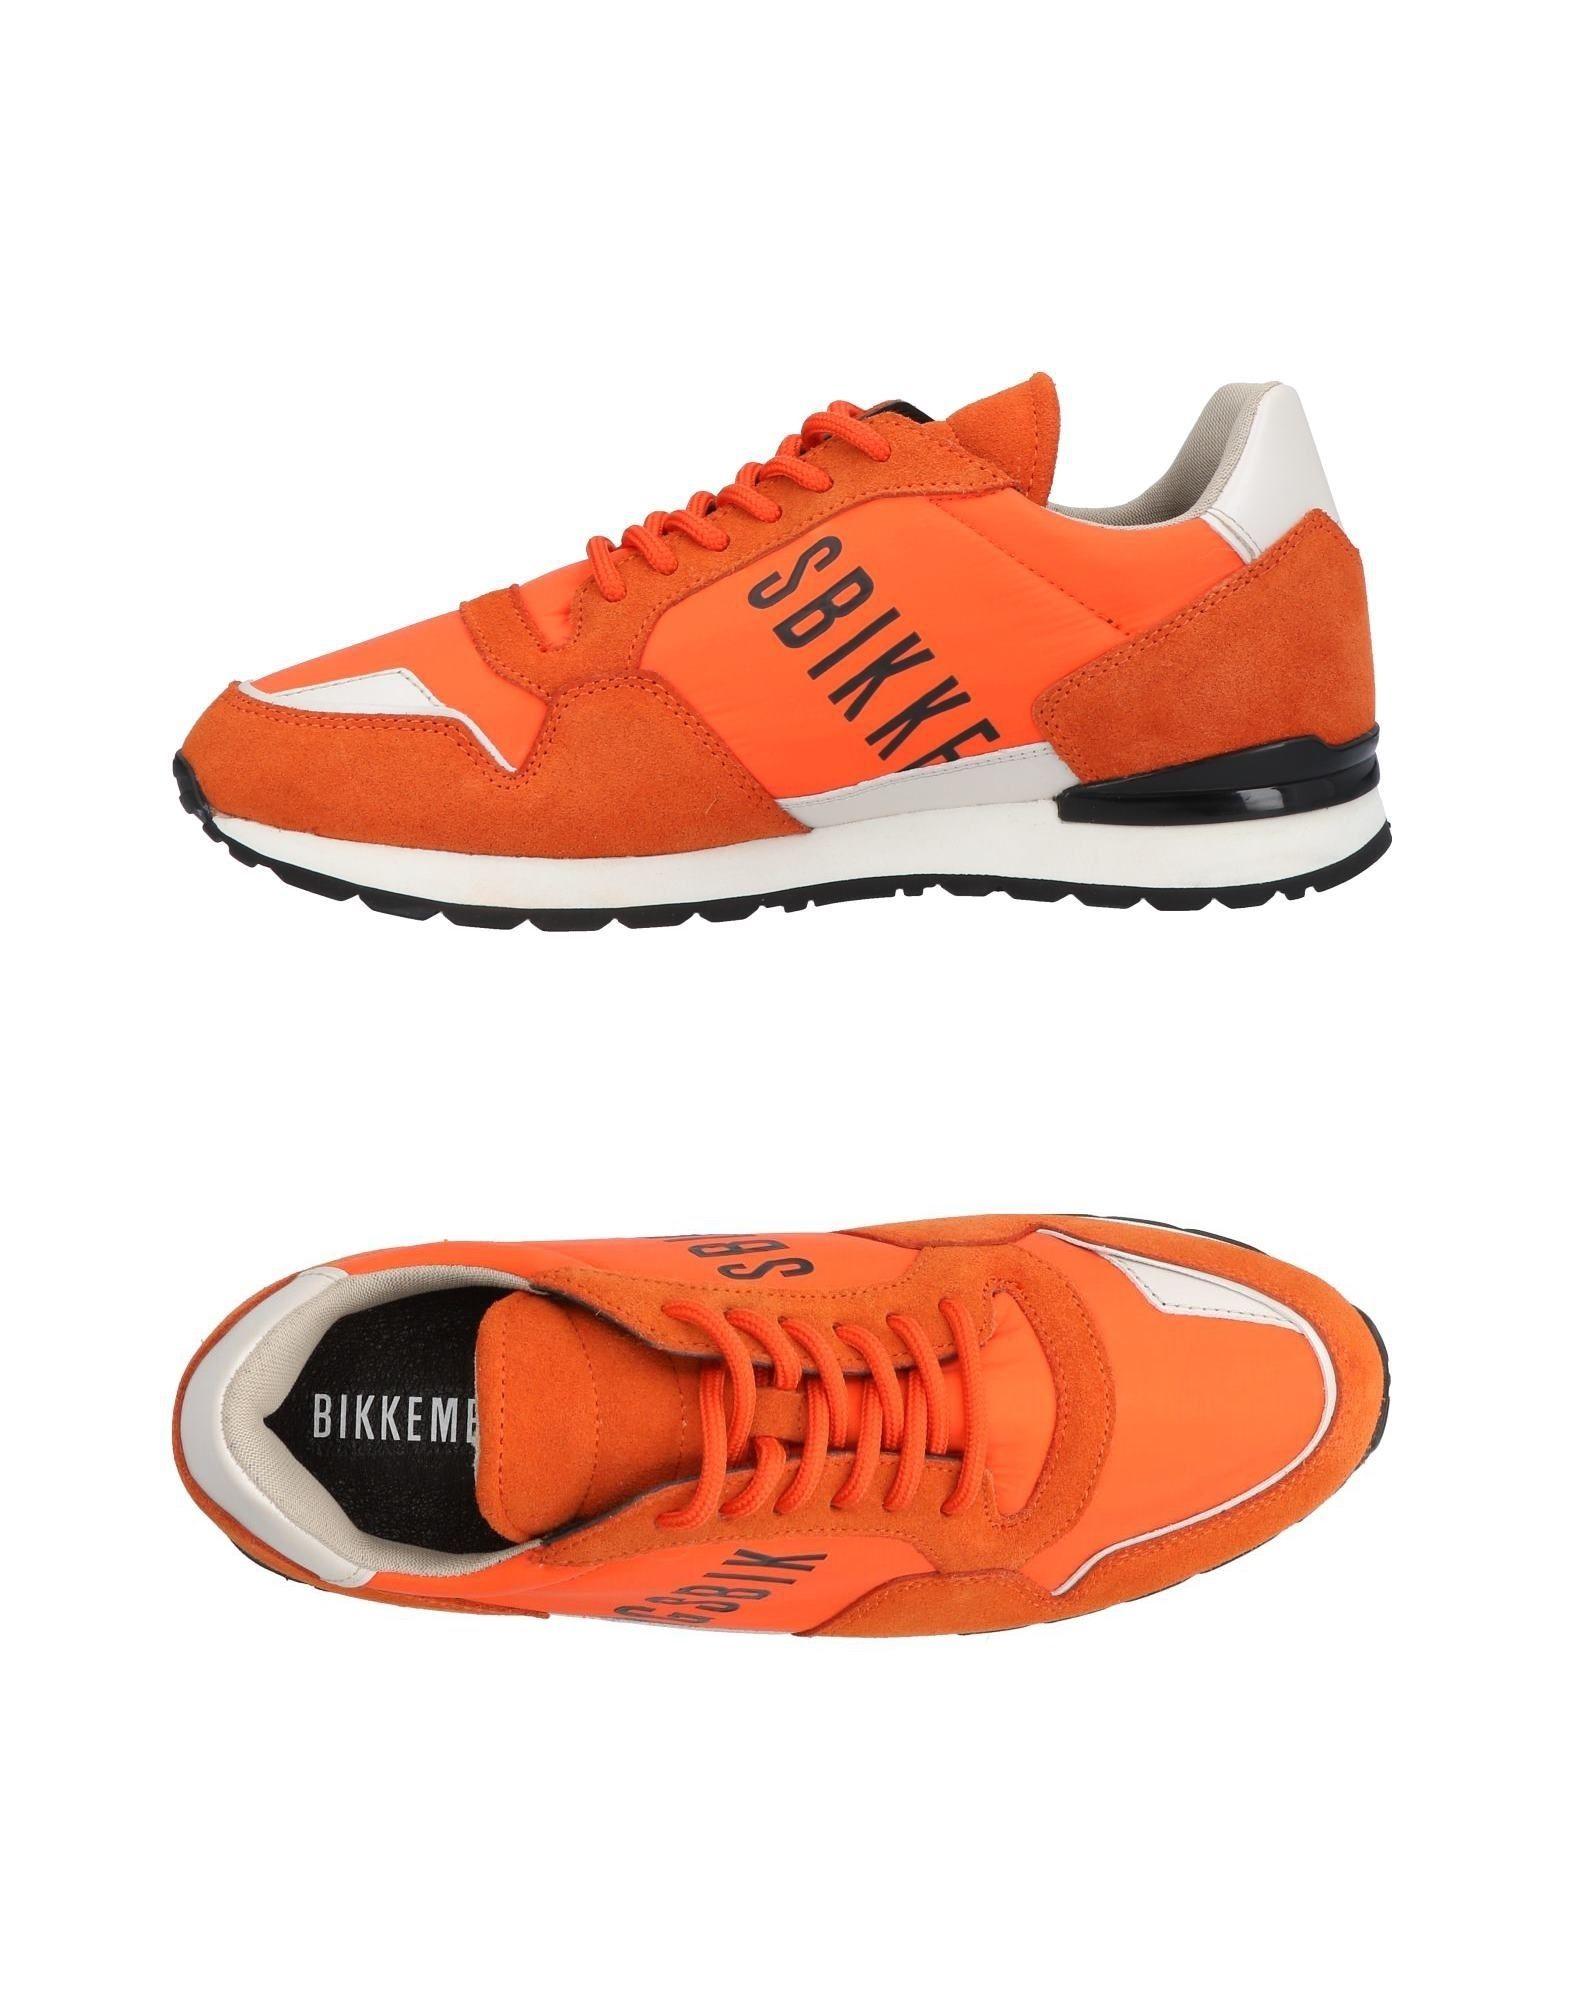 Stilvolle billige Sneakers Schuhe Bikkembergs Sneakers billige Damen  11450919NT d365c6